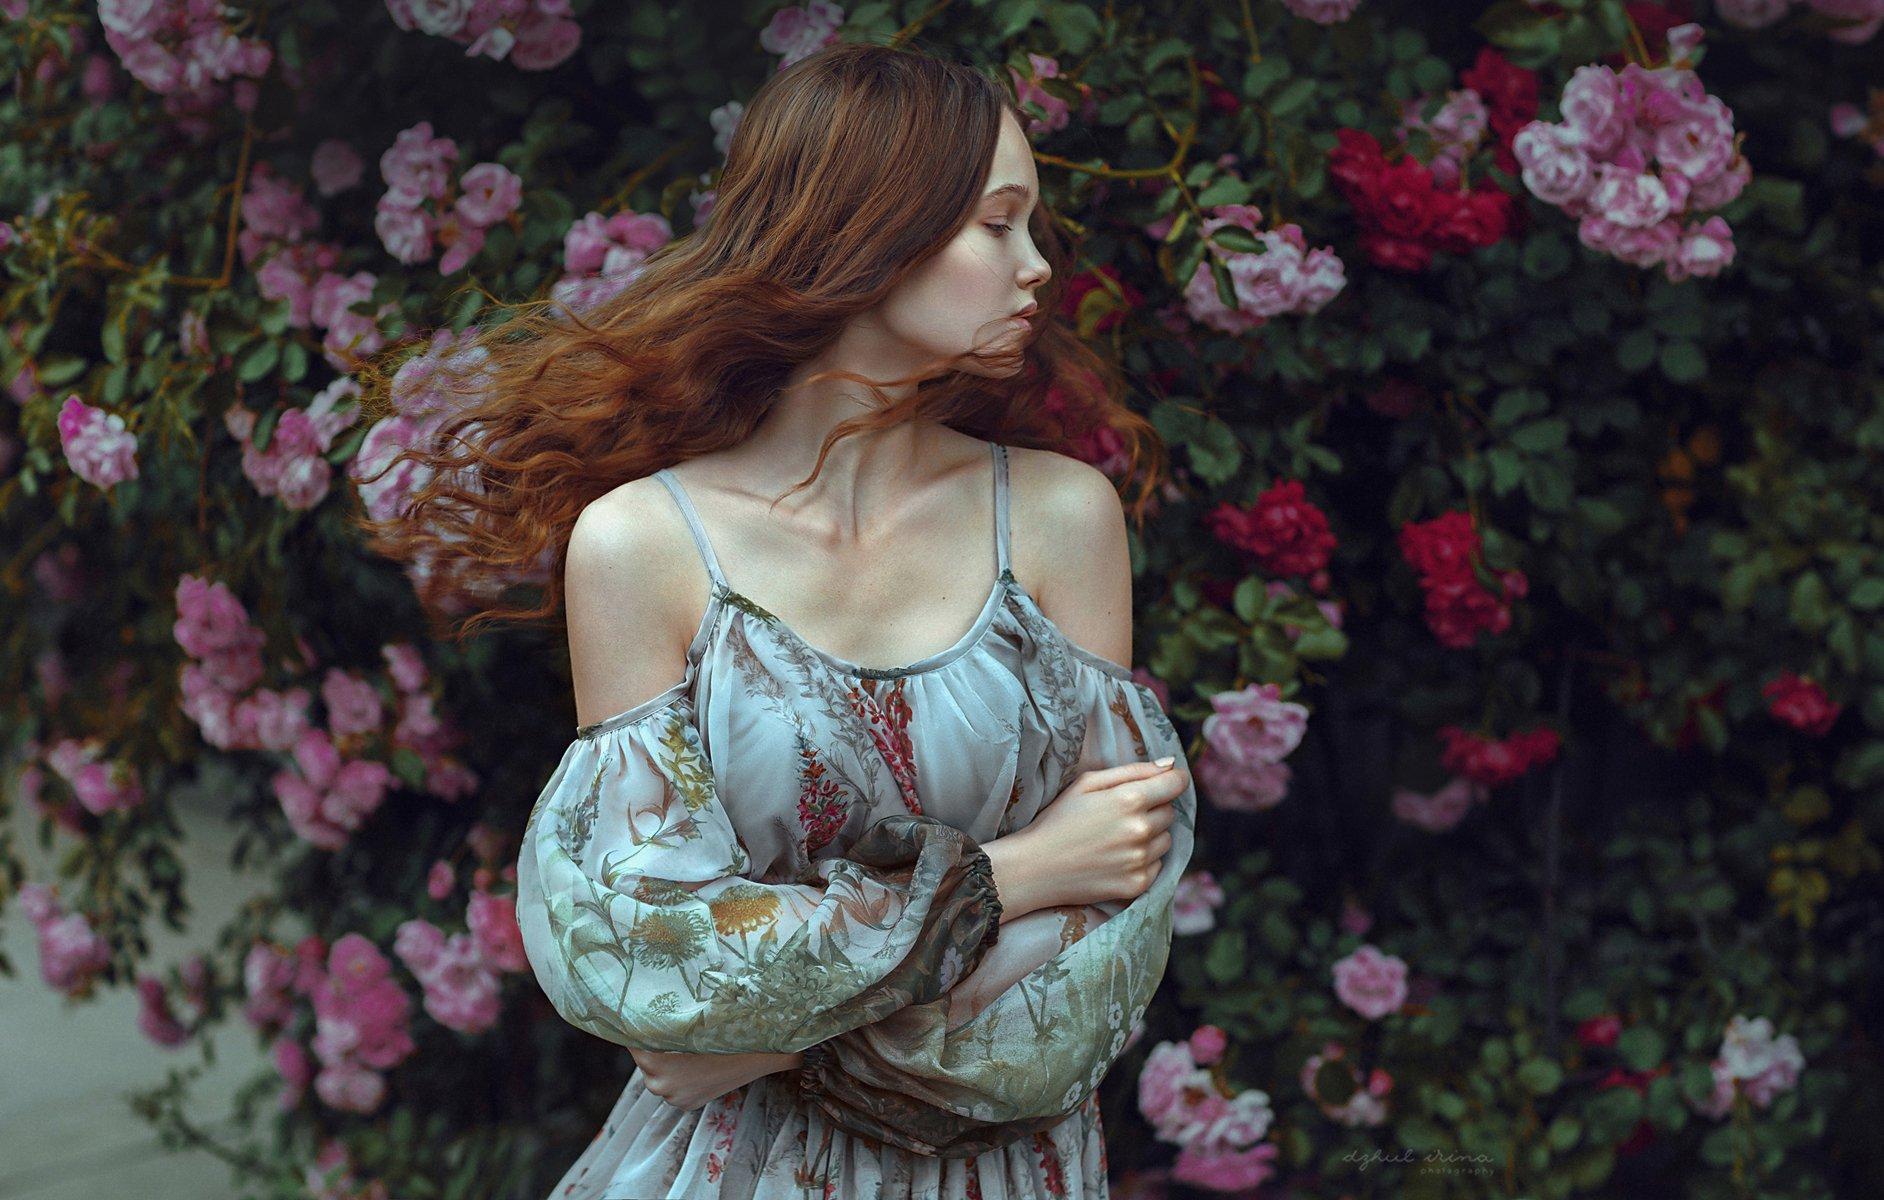 Dress, Dzhul irina, Flowers, Girl, Hair, Irinadzhul, People, Portrait, Red, Ирина Джуль